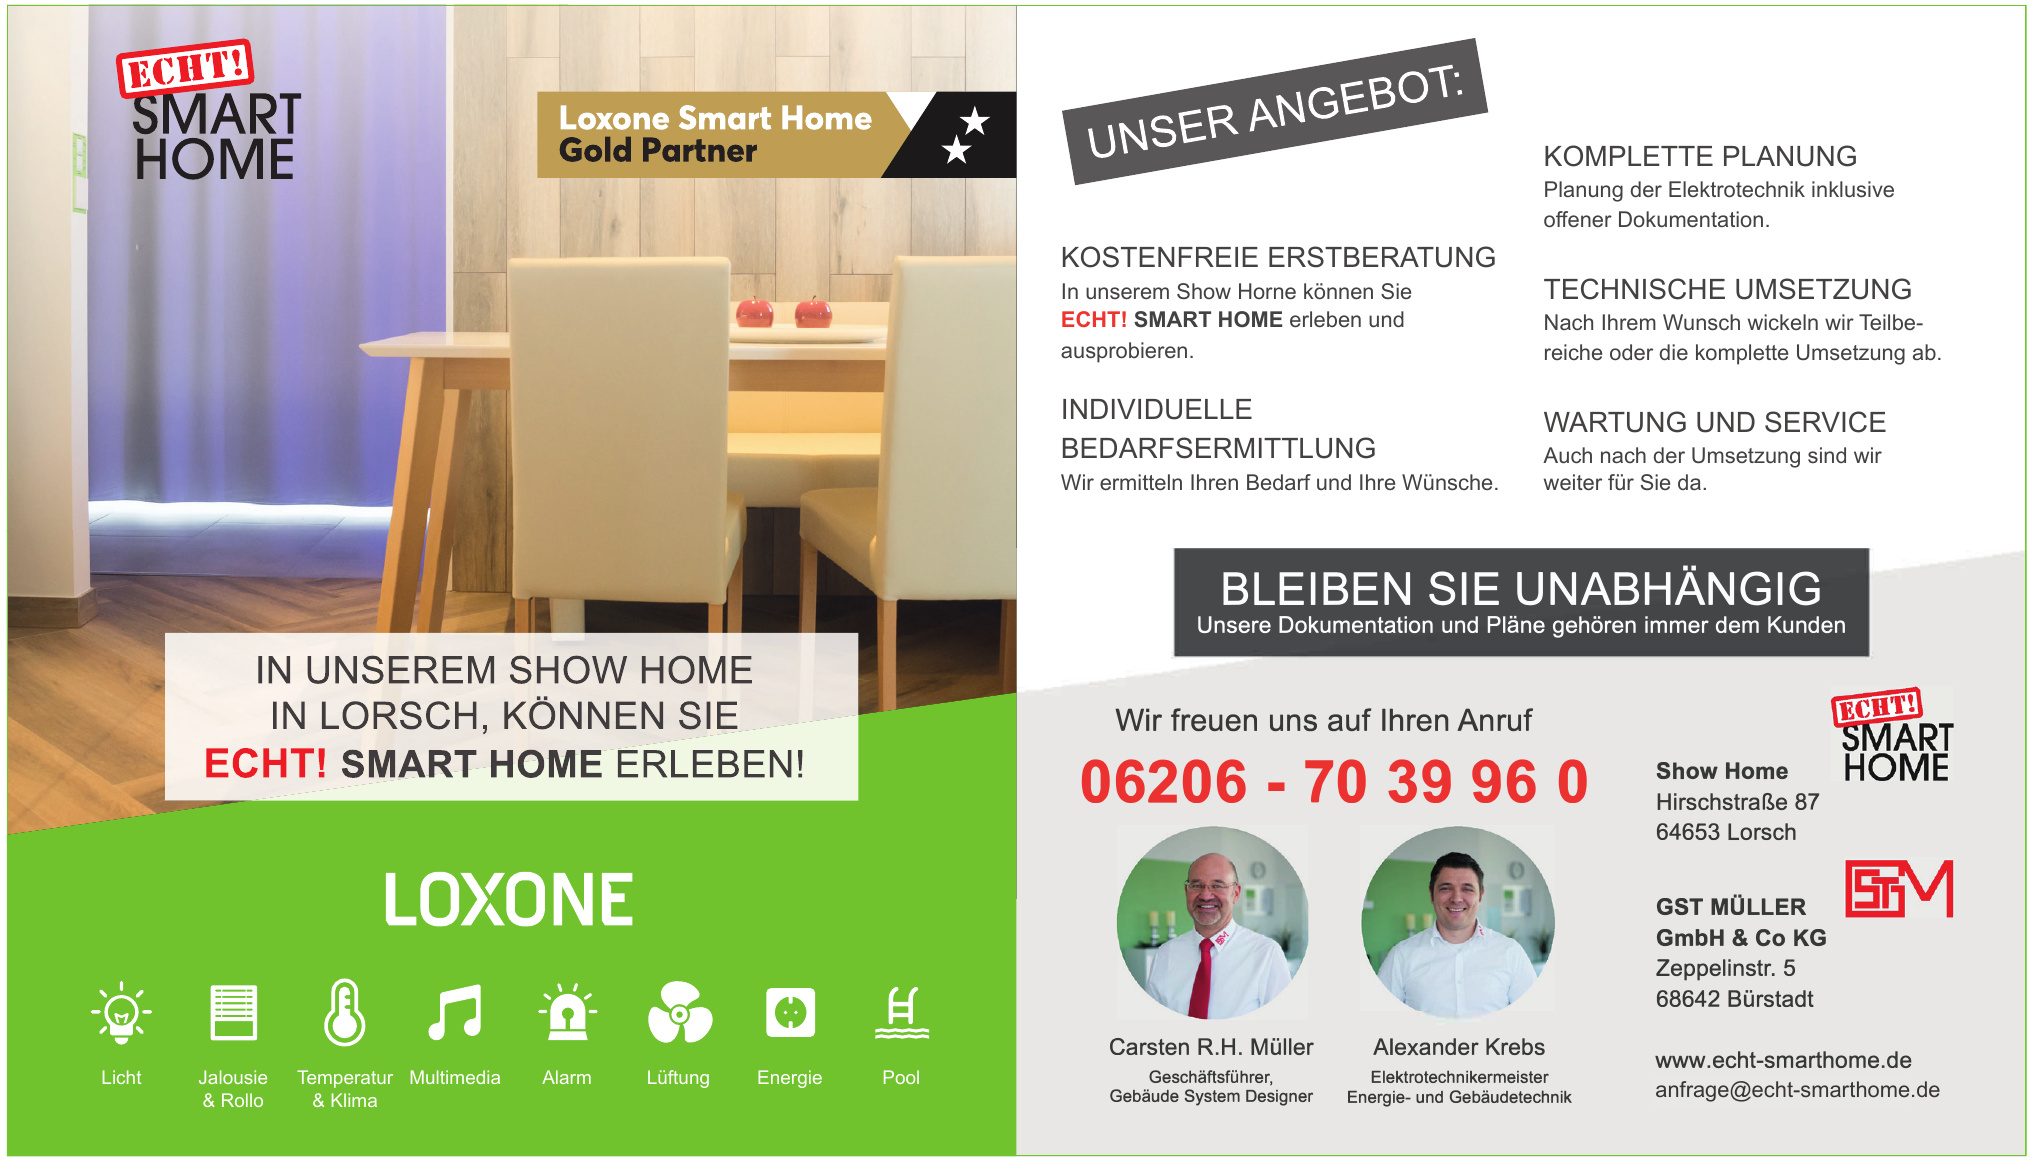 GST MÜLLER GmbH &Co KG